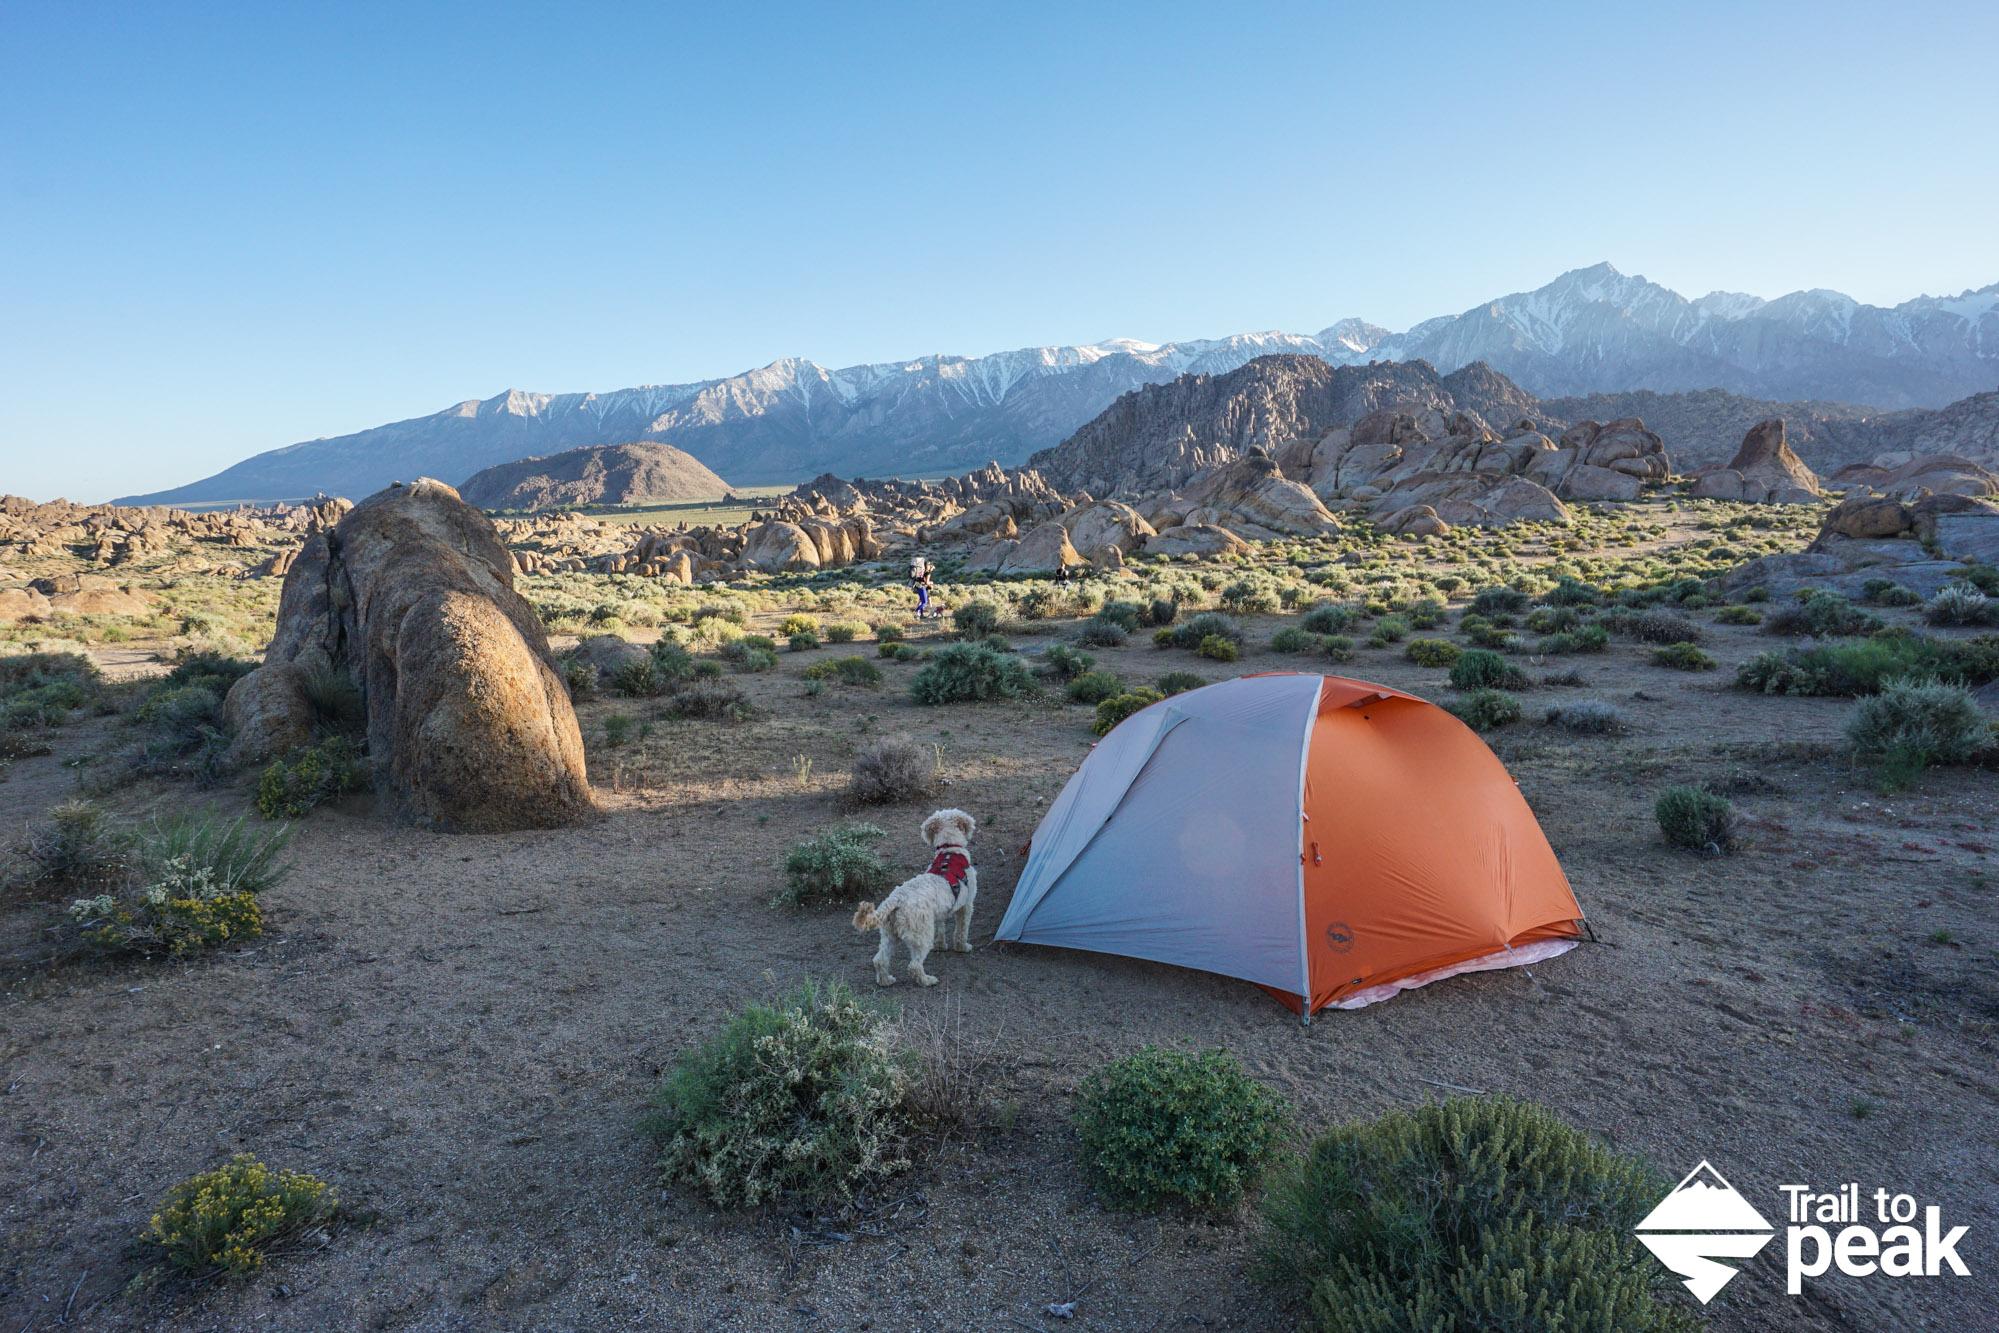 Gear Review Big Agnes Copper Spur HV UL 3 Tent & Gear Review: Big Agnes Copper Spur HV UL3 Tent - Trail to Peak